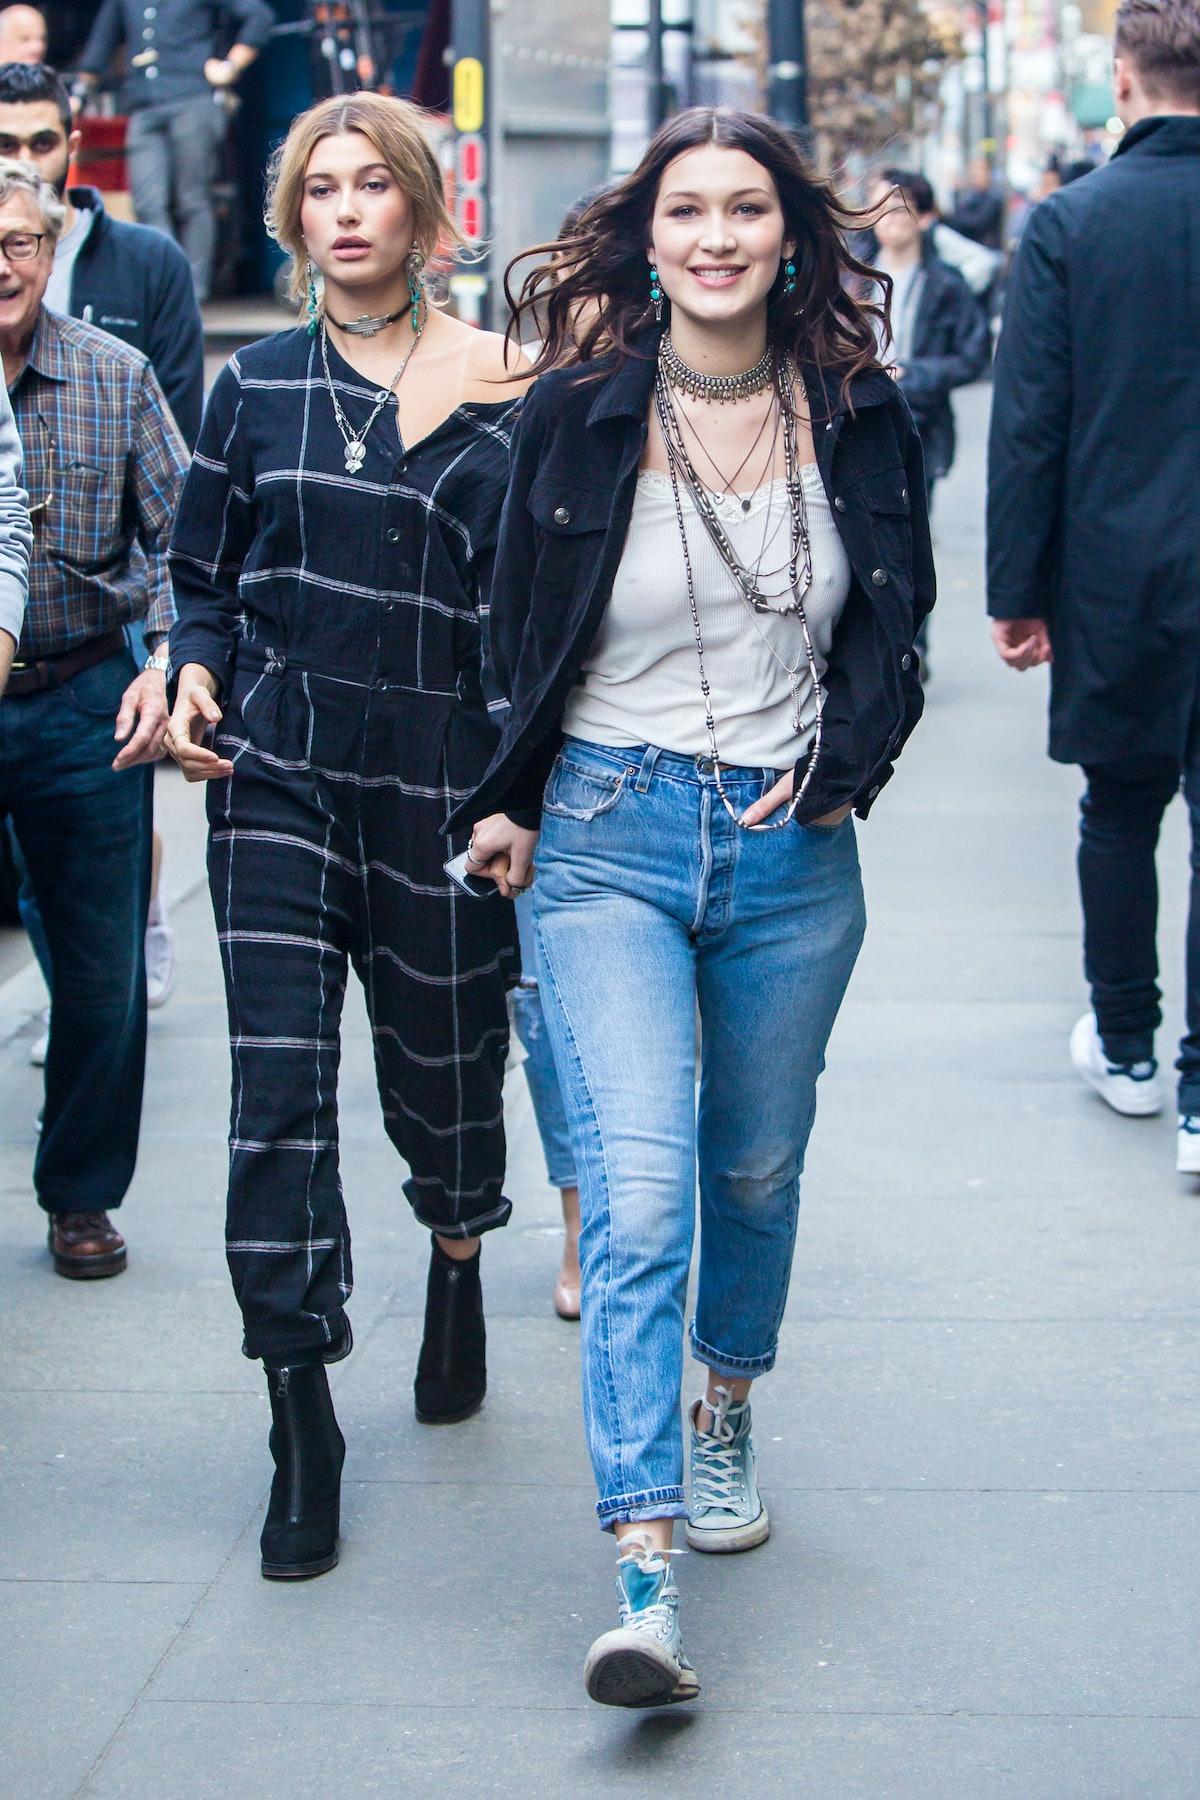 Celebrity Sightings In New York City - April 02, 2015